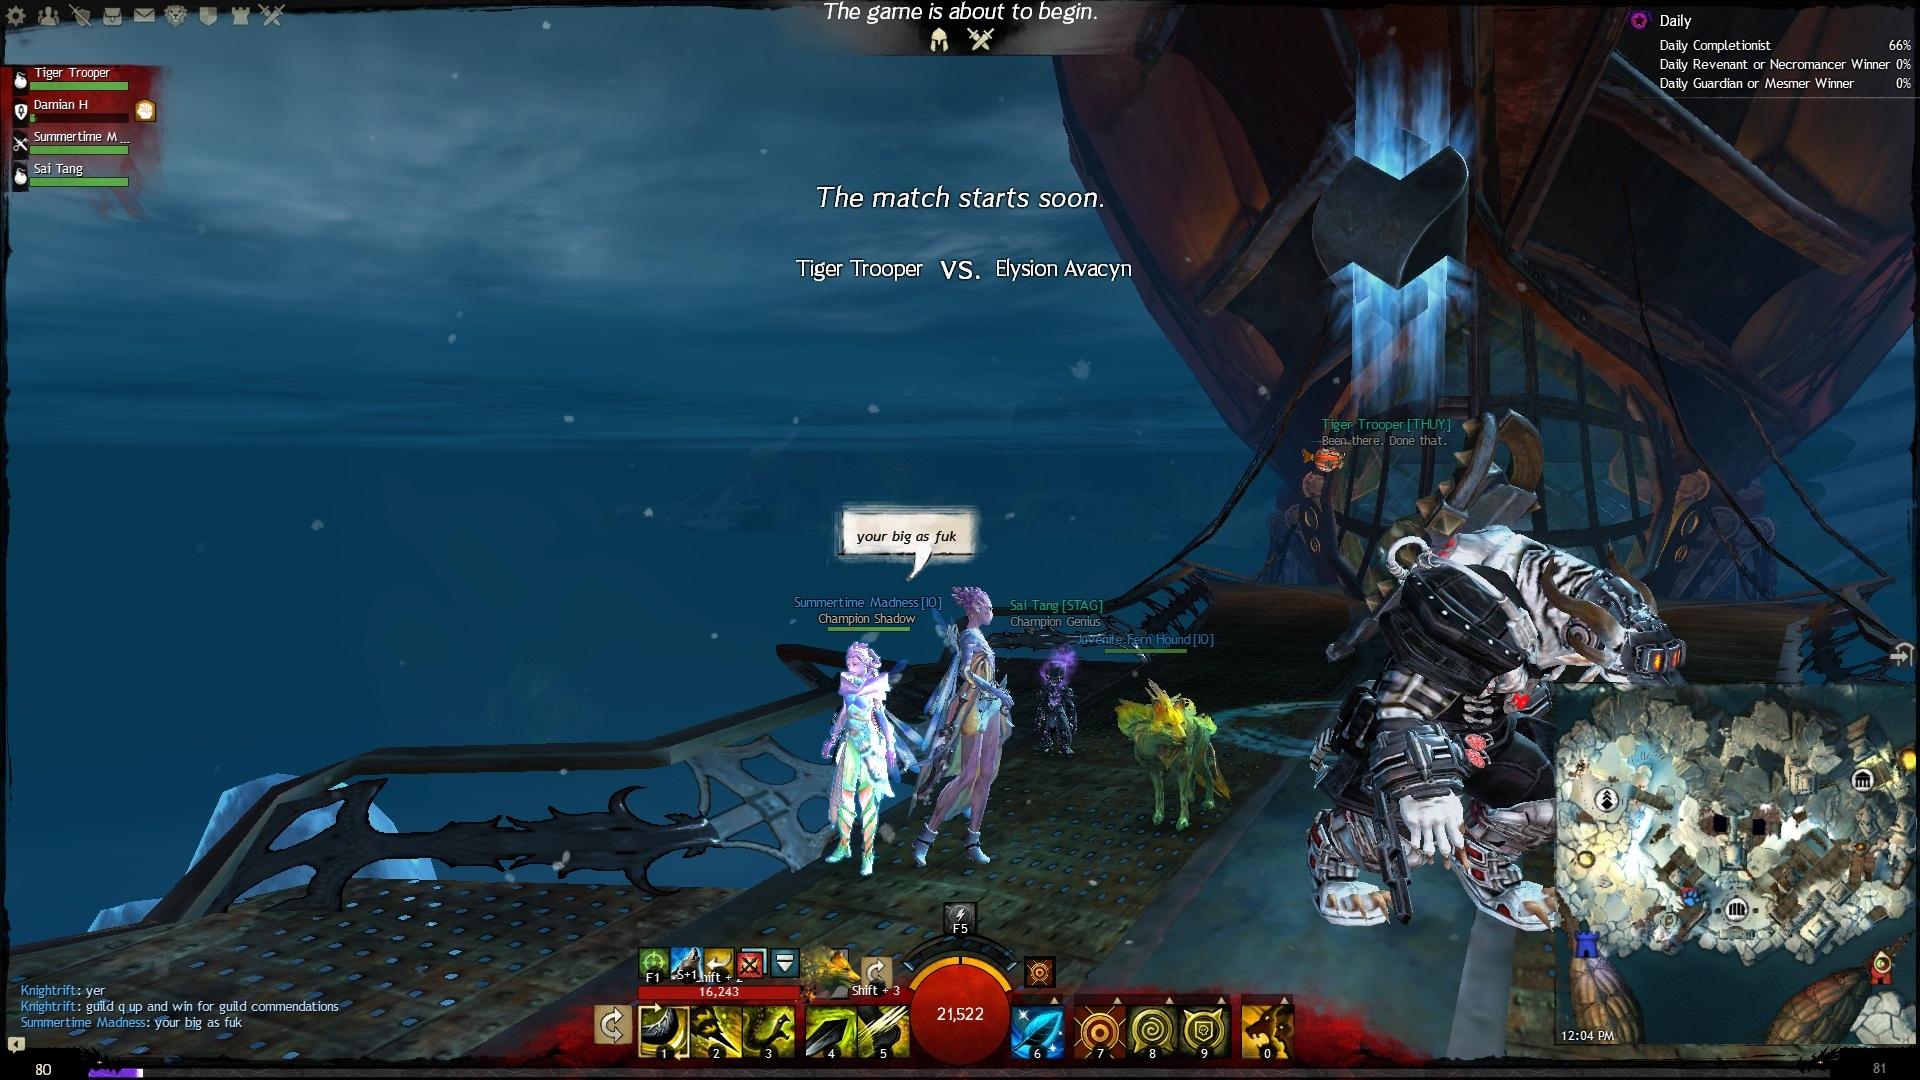 Guild wars 2 gw2 darkened desires gw2 fashion - Medium Armor On Sylvari